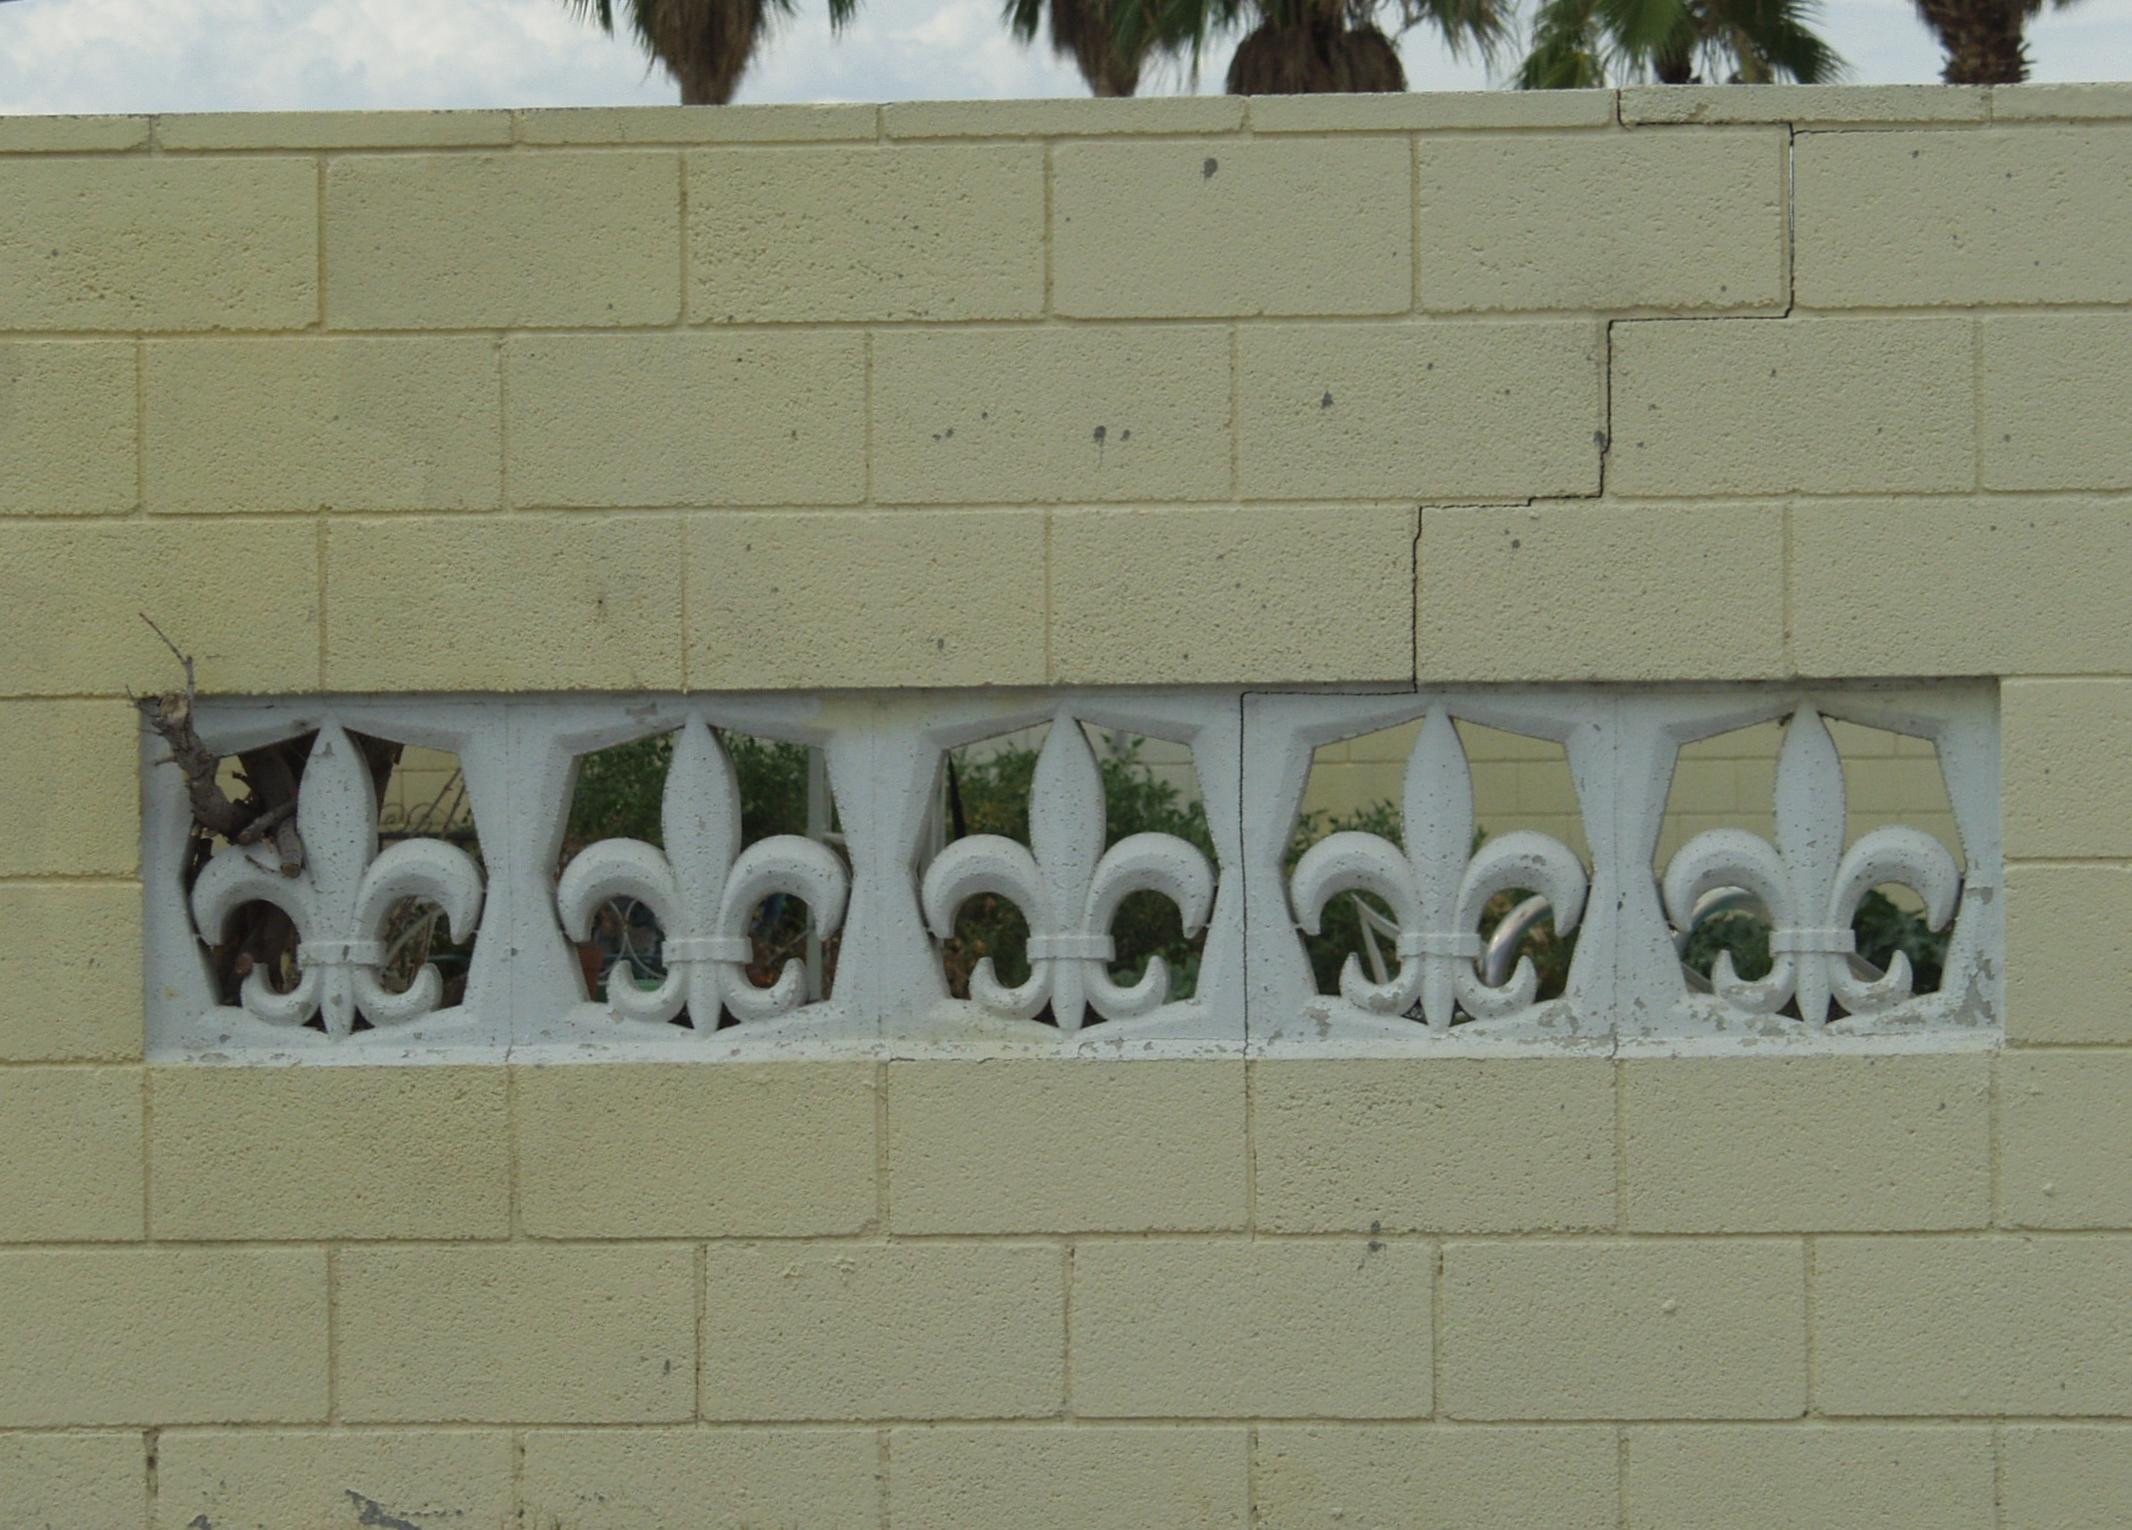 pics screen palms lowes outdoor paradise of cinder architecture the block decor decorative concrete